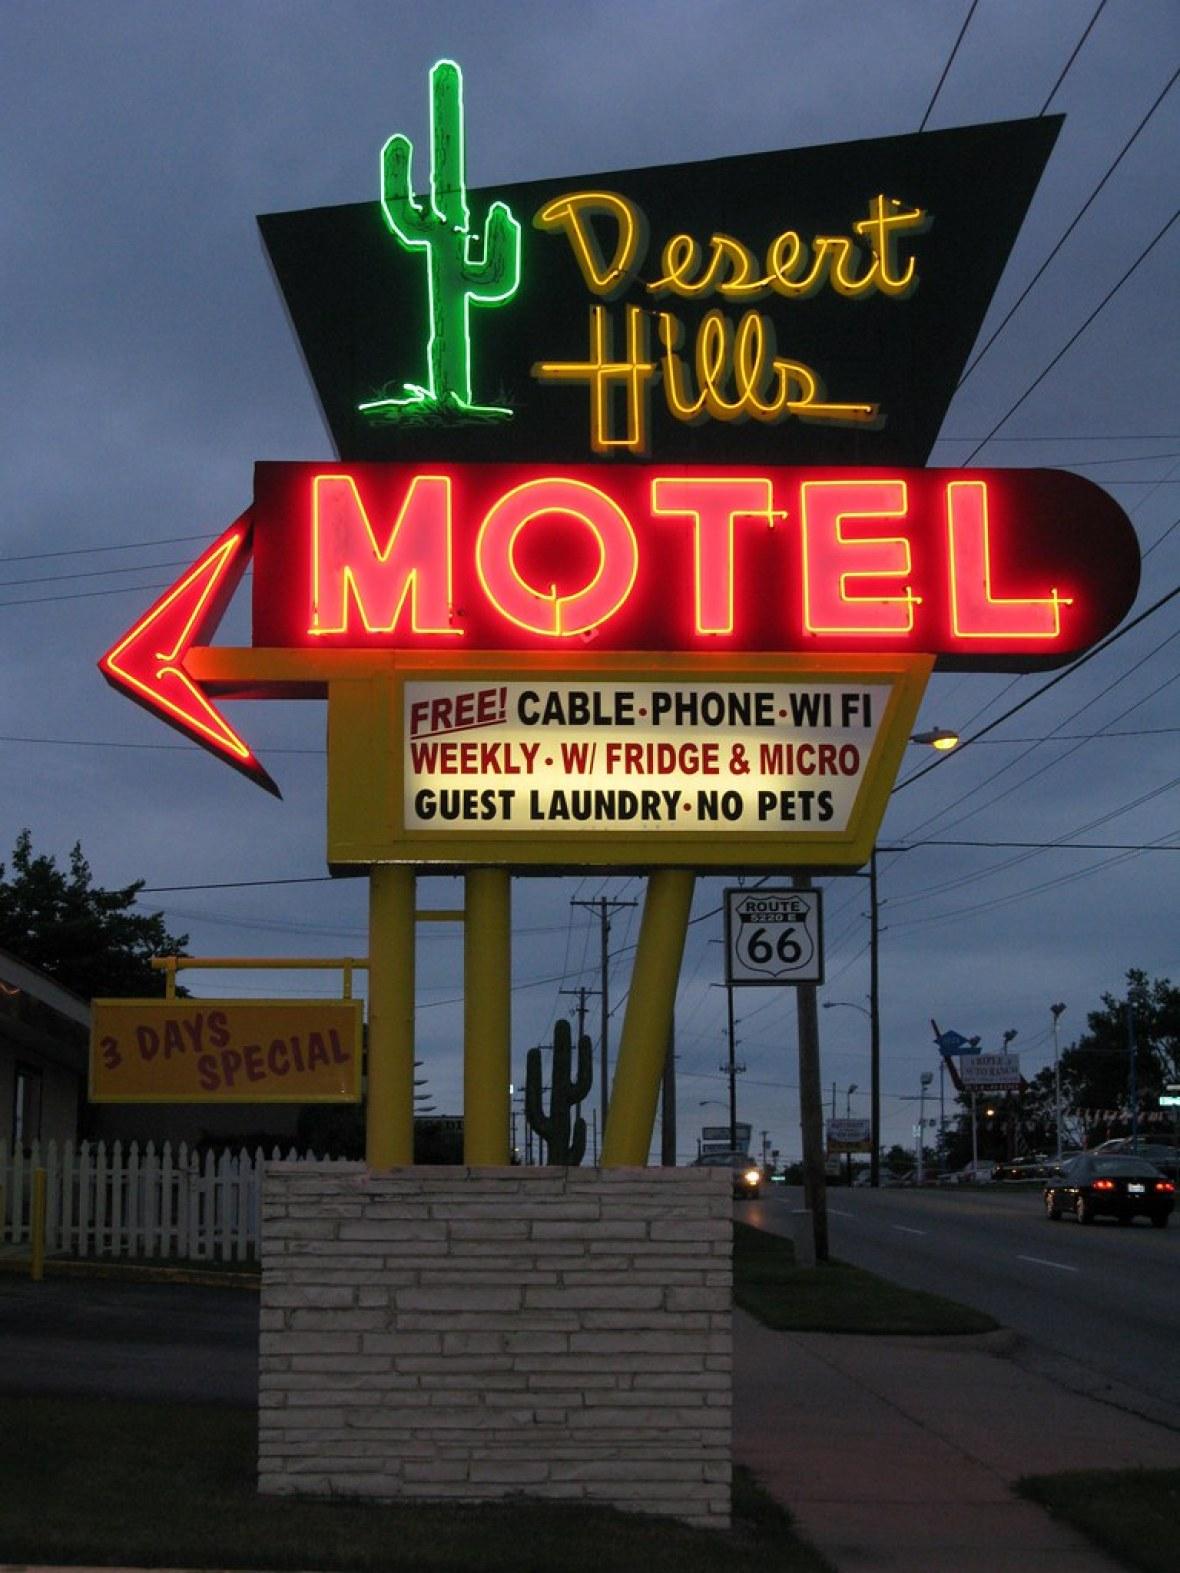 Desert Hills Motel - 5220 East 11th Street, Tulsa, Oklahoma U.S.A. - May 9, 2009